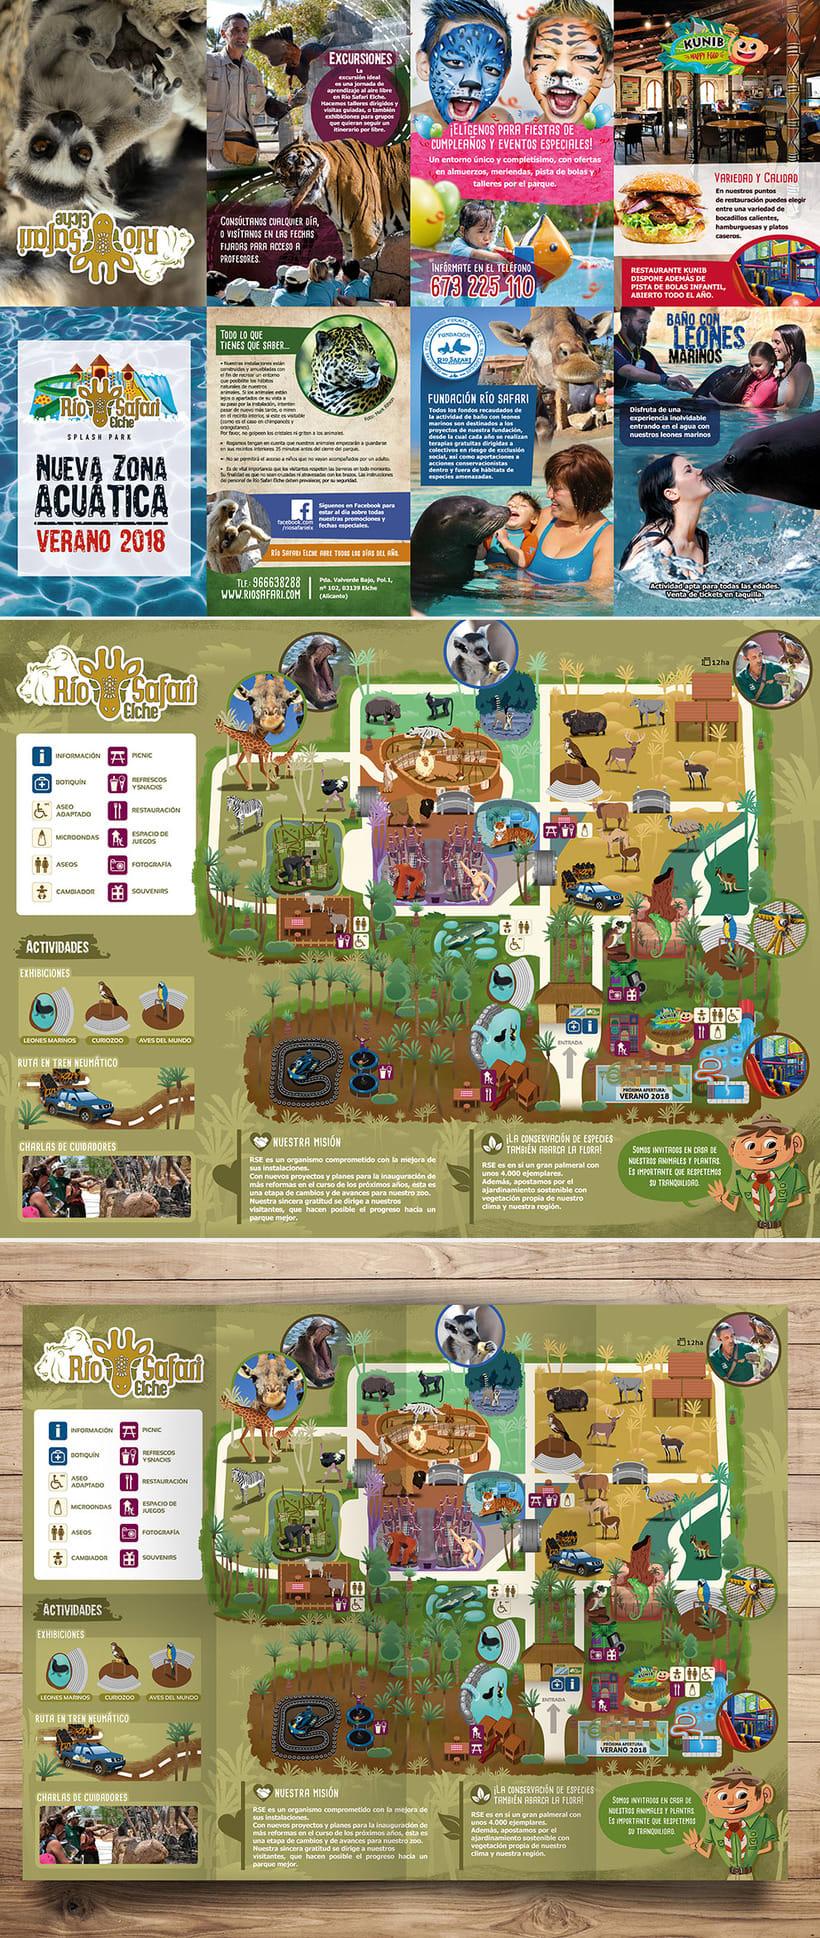 Ilustraciones para Rio Safari Elche 4